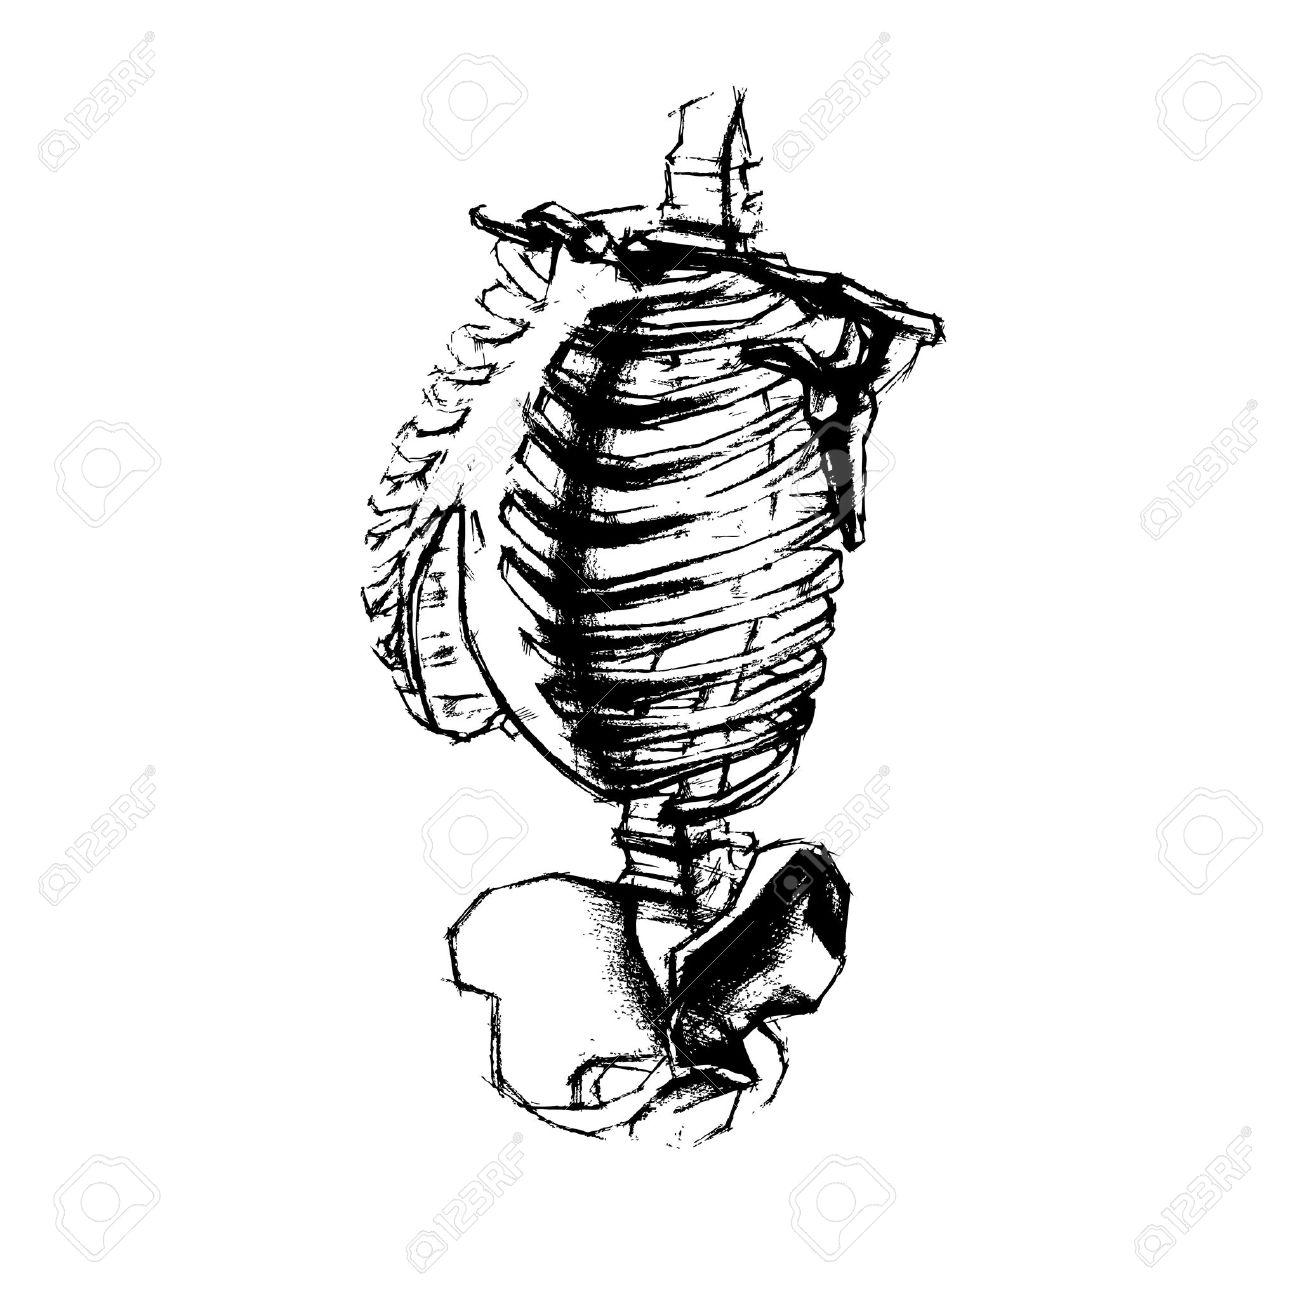 1300x1300 Illustration Of Academic Drawing Human Torso. Vector Royalty Free